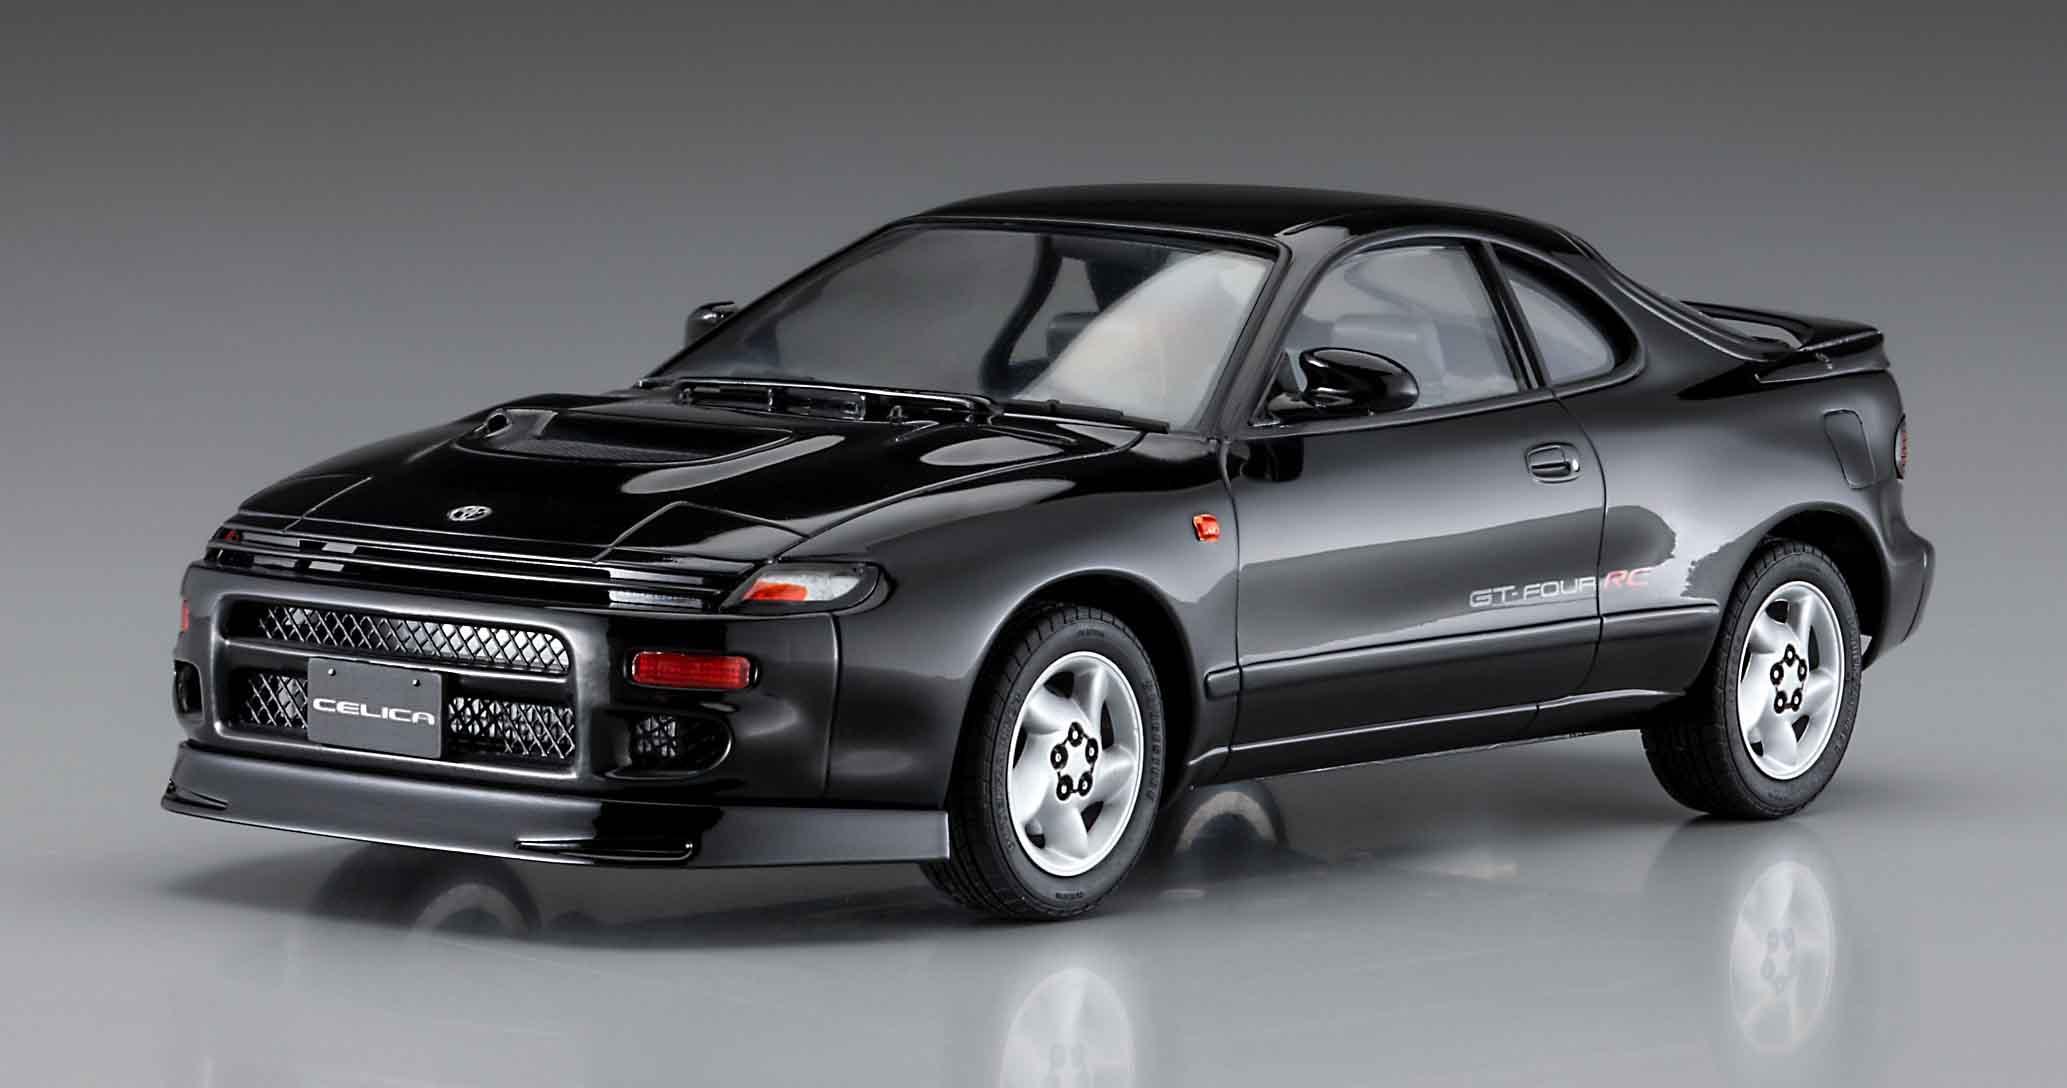 Hasegawa 1/24 Toyota Celica GT-Four RC W/Lip Spoiler